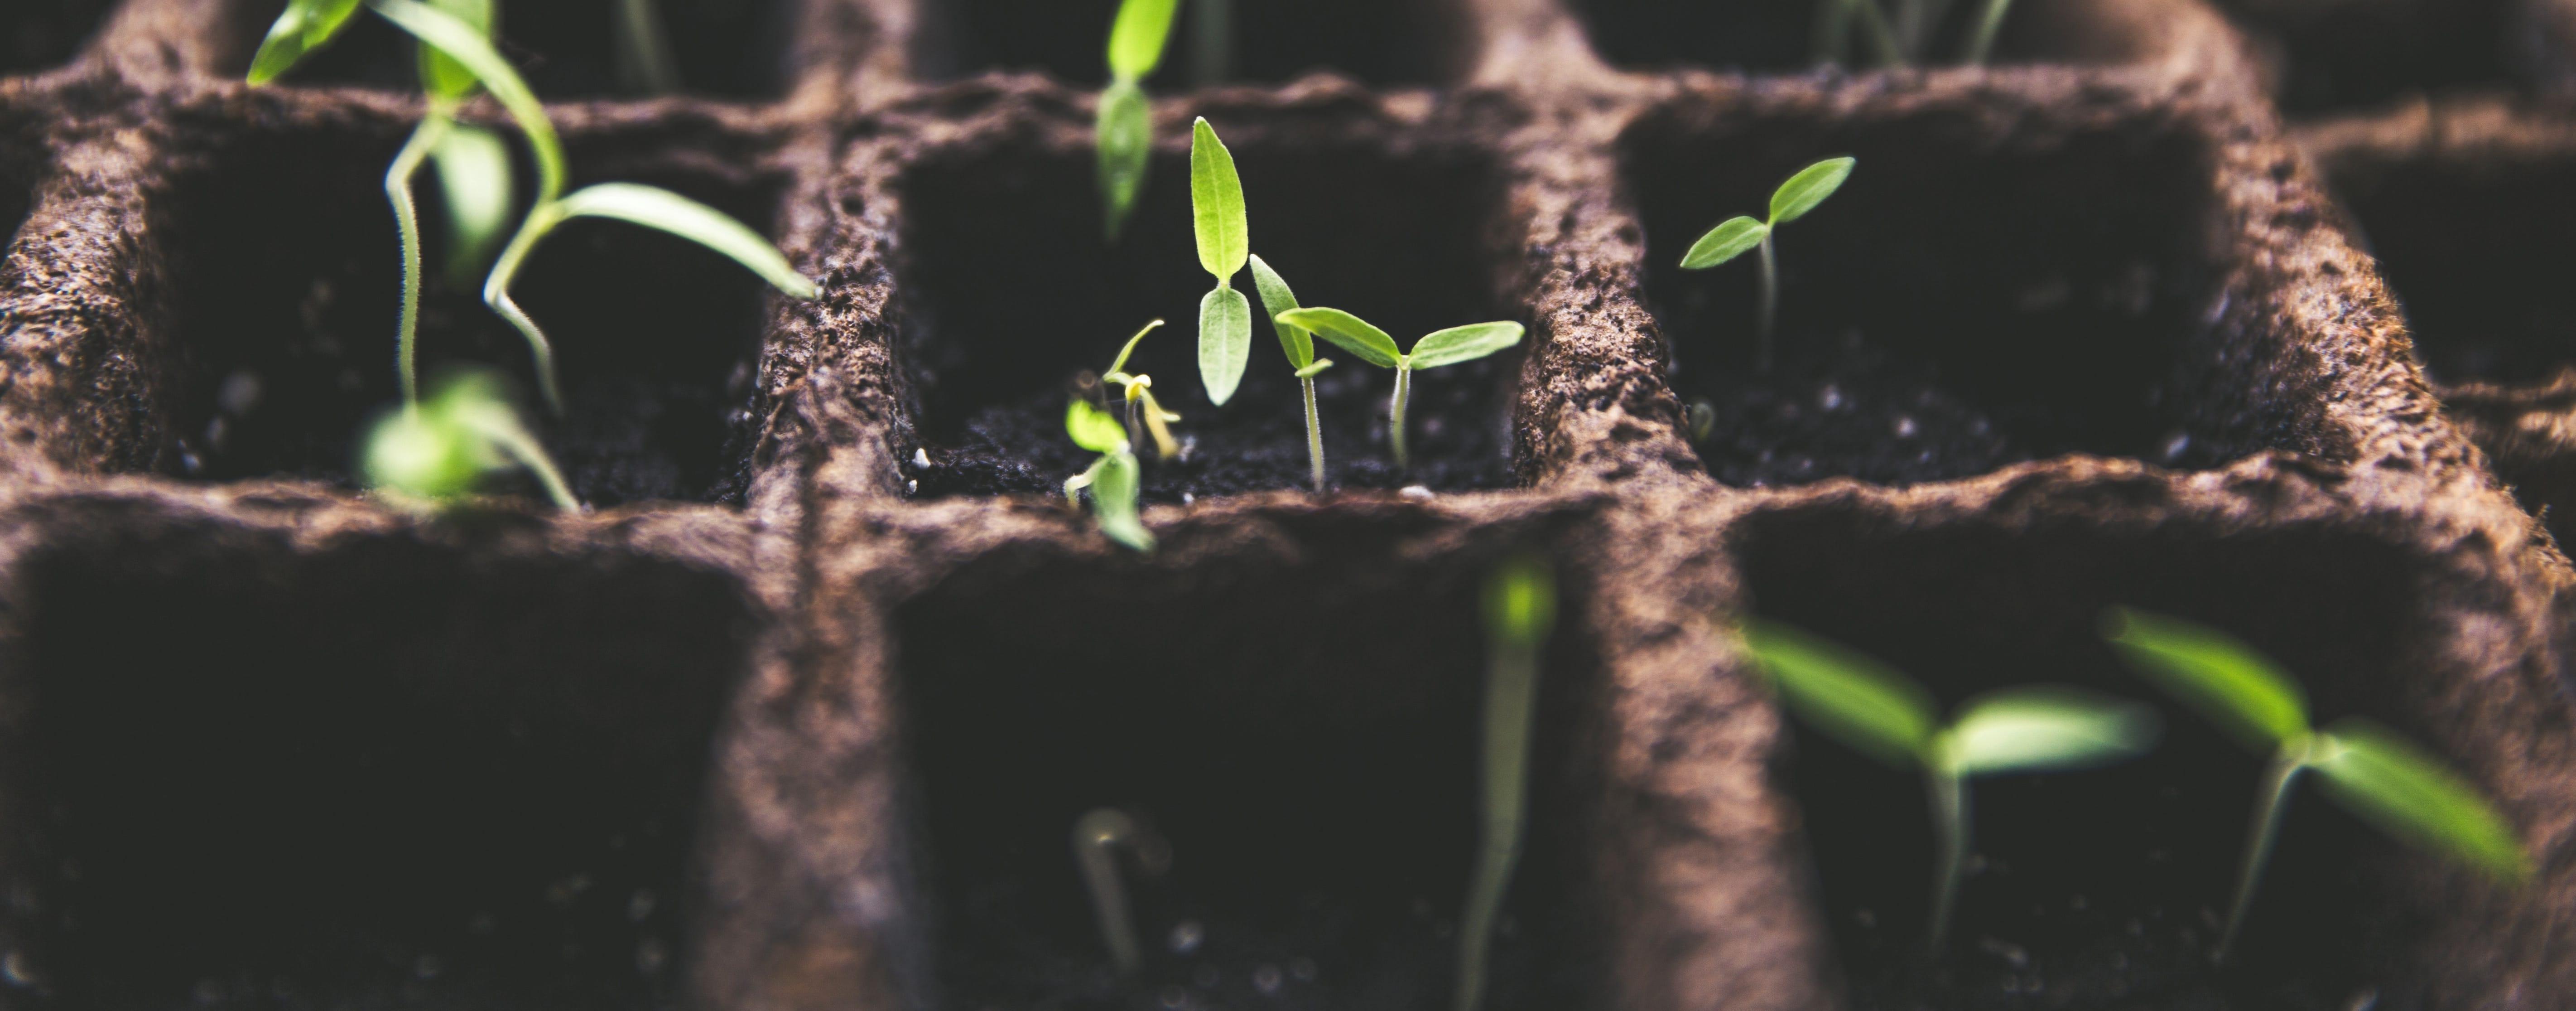 Photo of sprouting plants. Credit Markus Spiske on unsplash